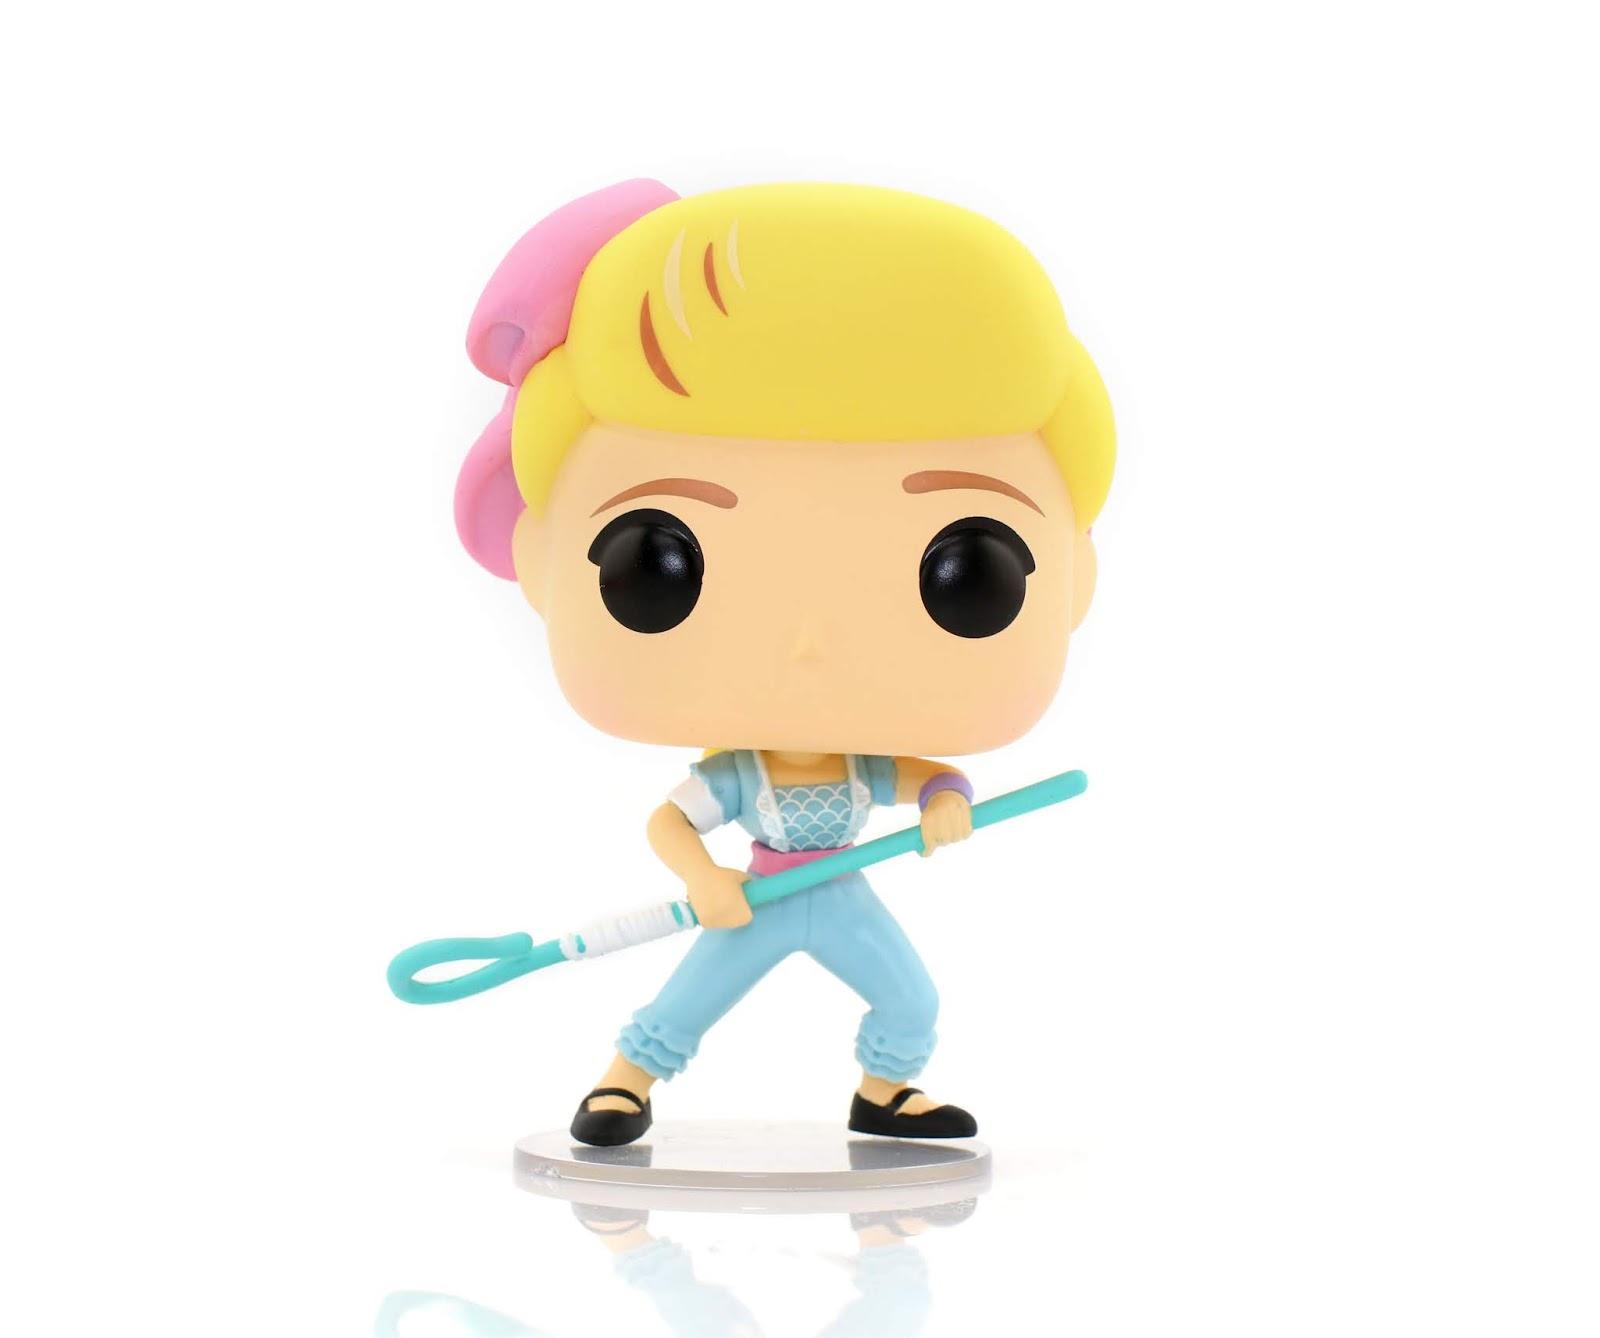 toy story 4 funko pop collection bo peep amazon